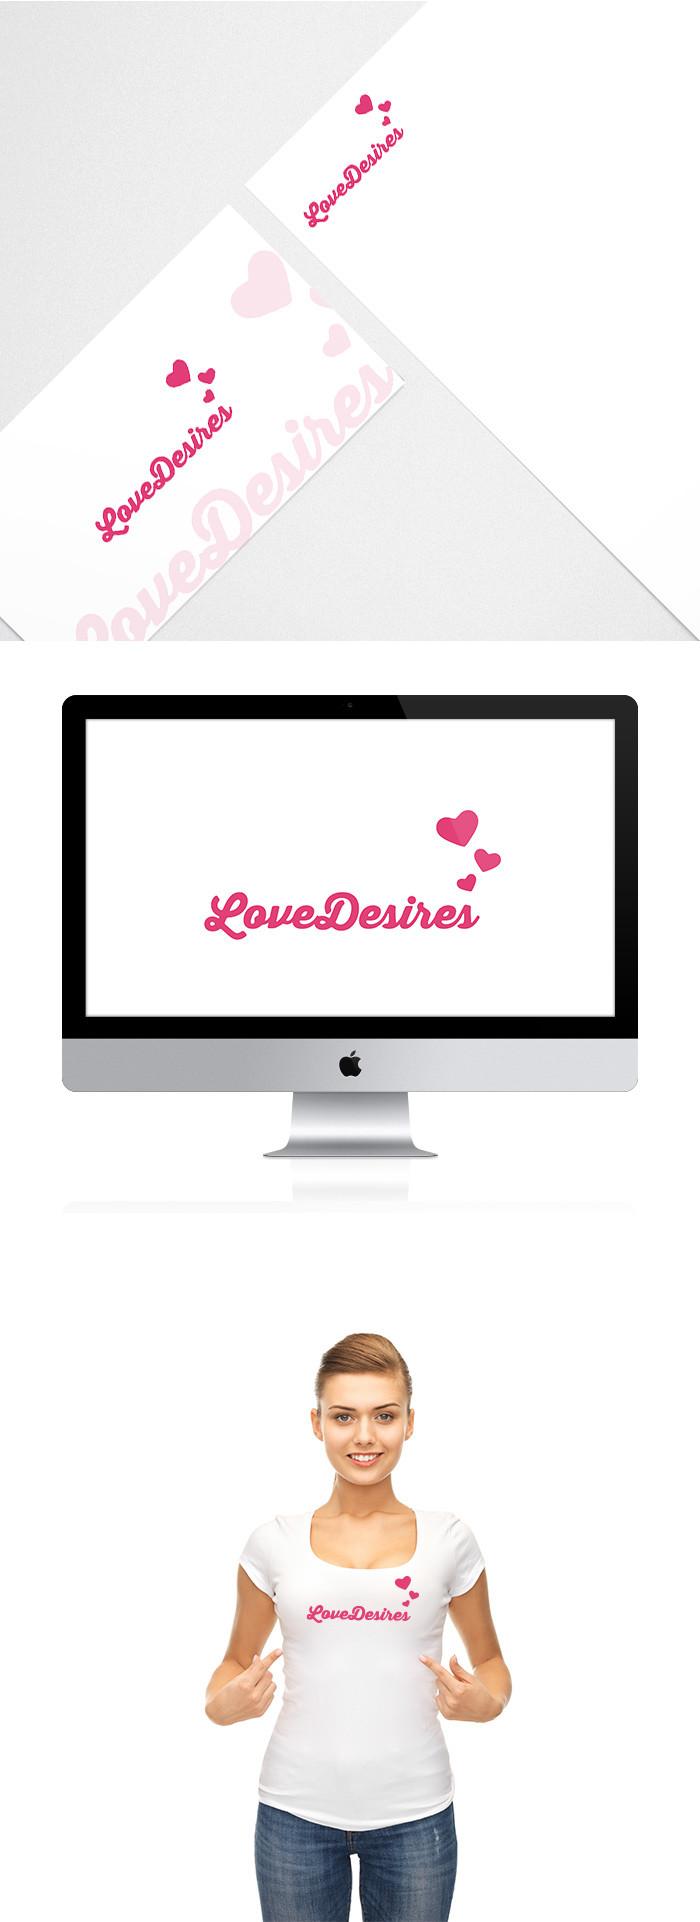 lovedesires-logo-design_01